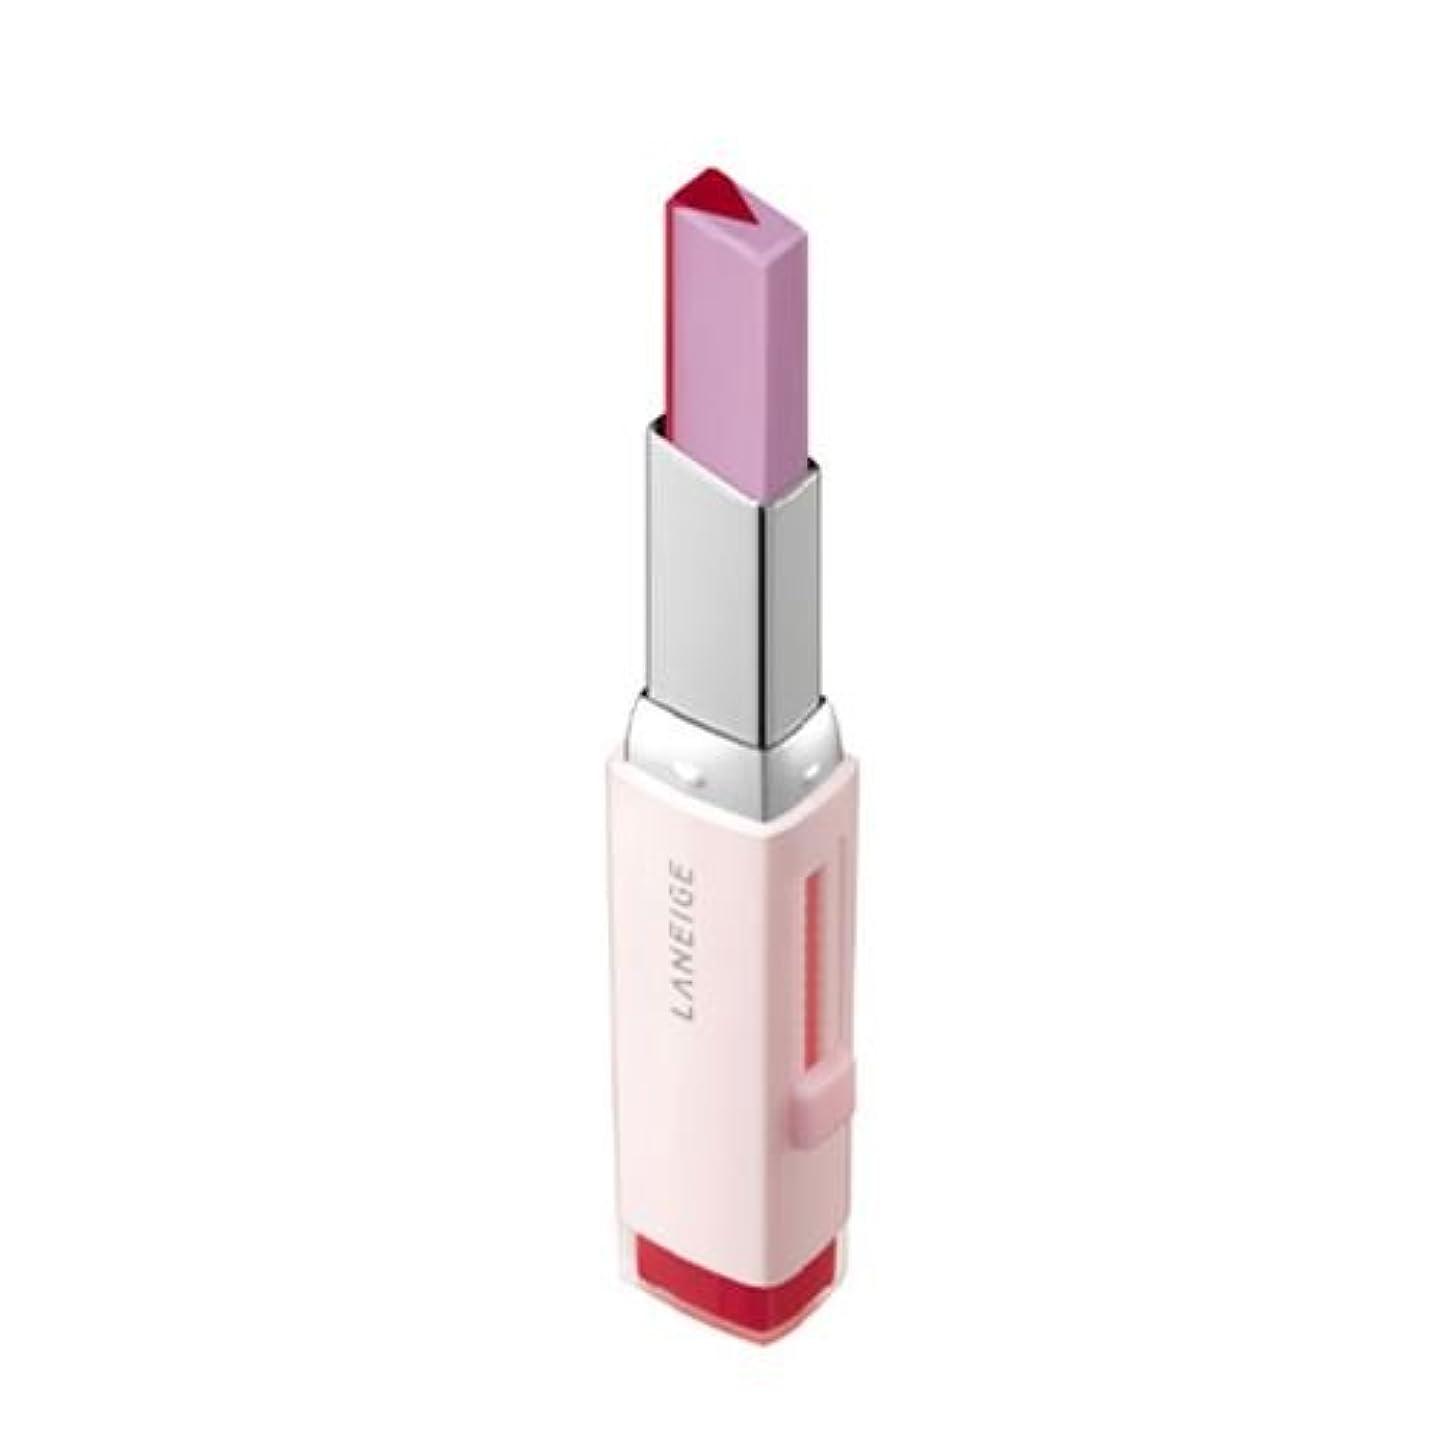 [New] LANEIGE Two Tone Tint Lip Bar 2g/ラネージュ ツー トーン ティント リップ バー 2g (#07 Lollipop Red) [並行輸入品]